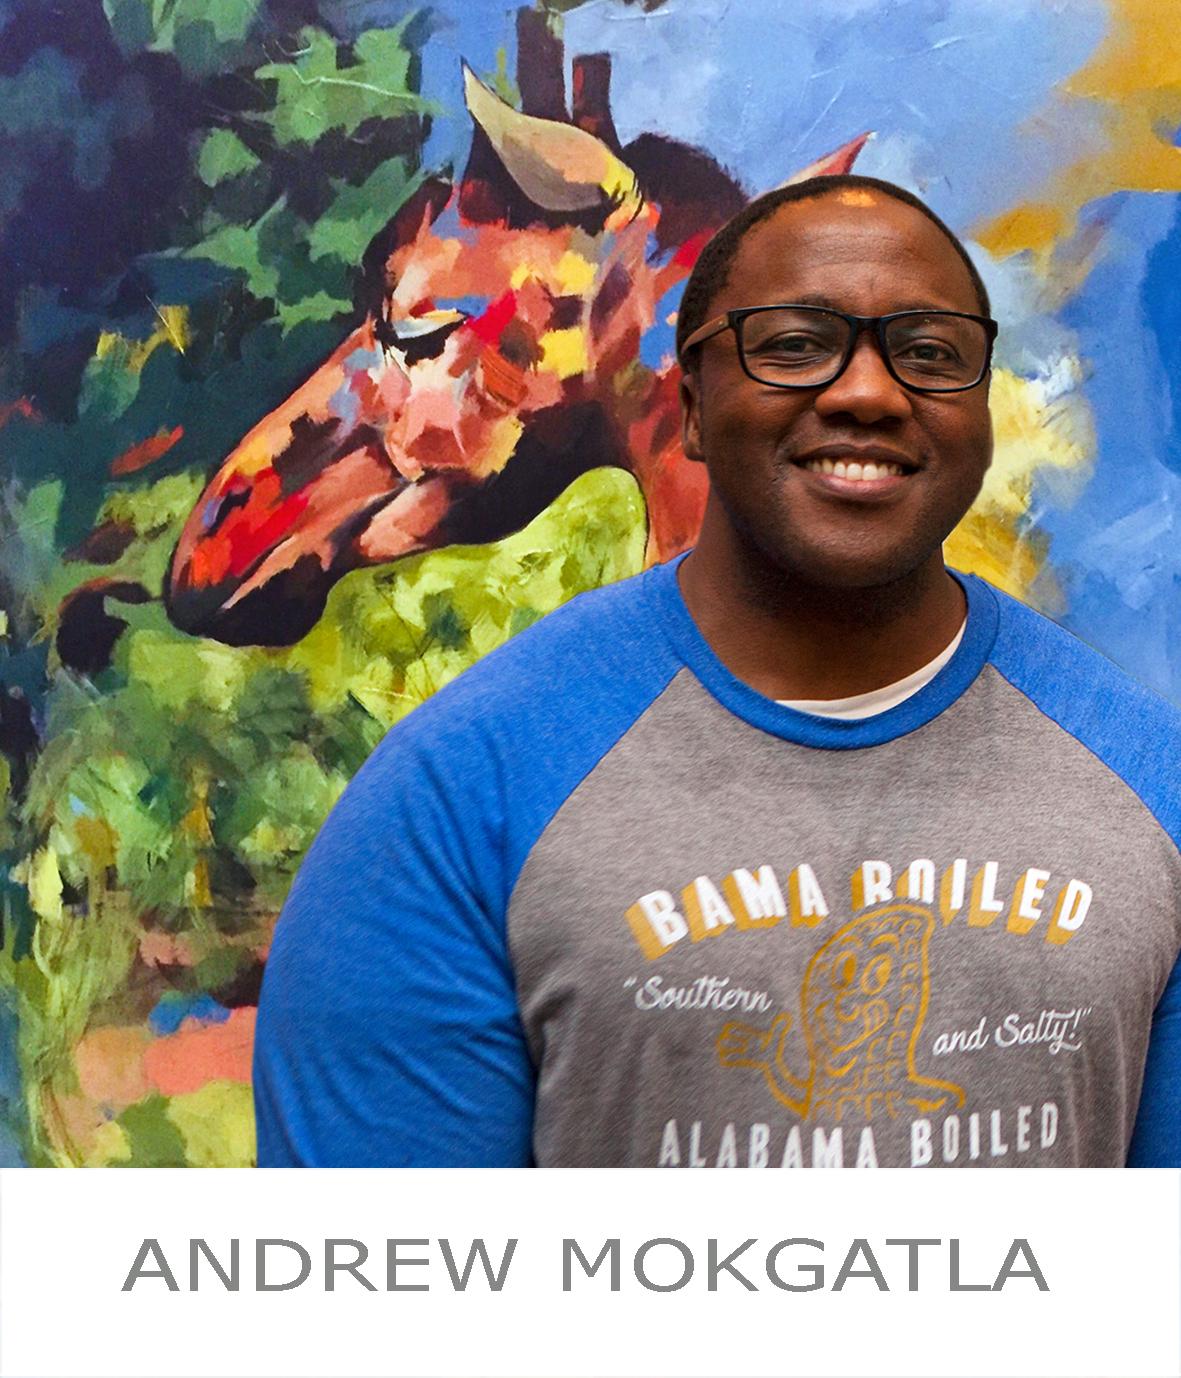 The Studio Art Gallery - Icon Image - Andrew Mokgatla